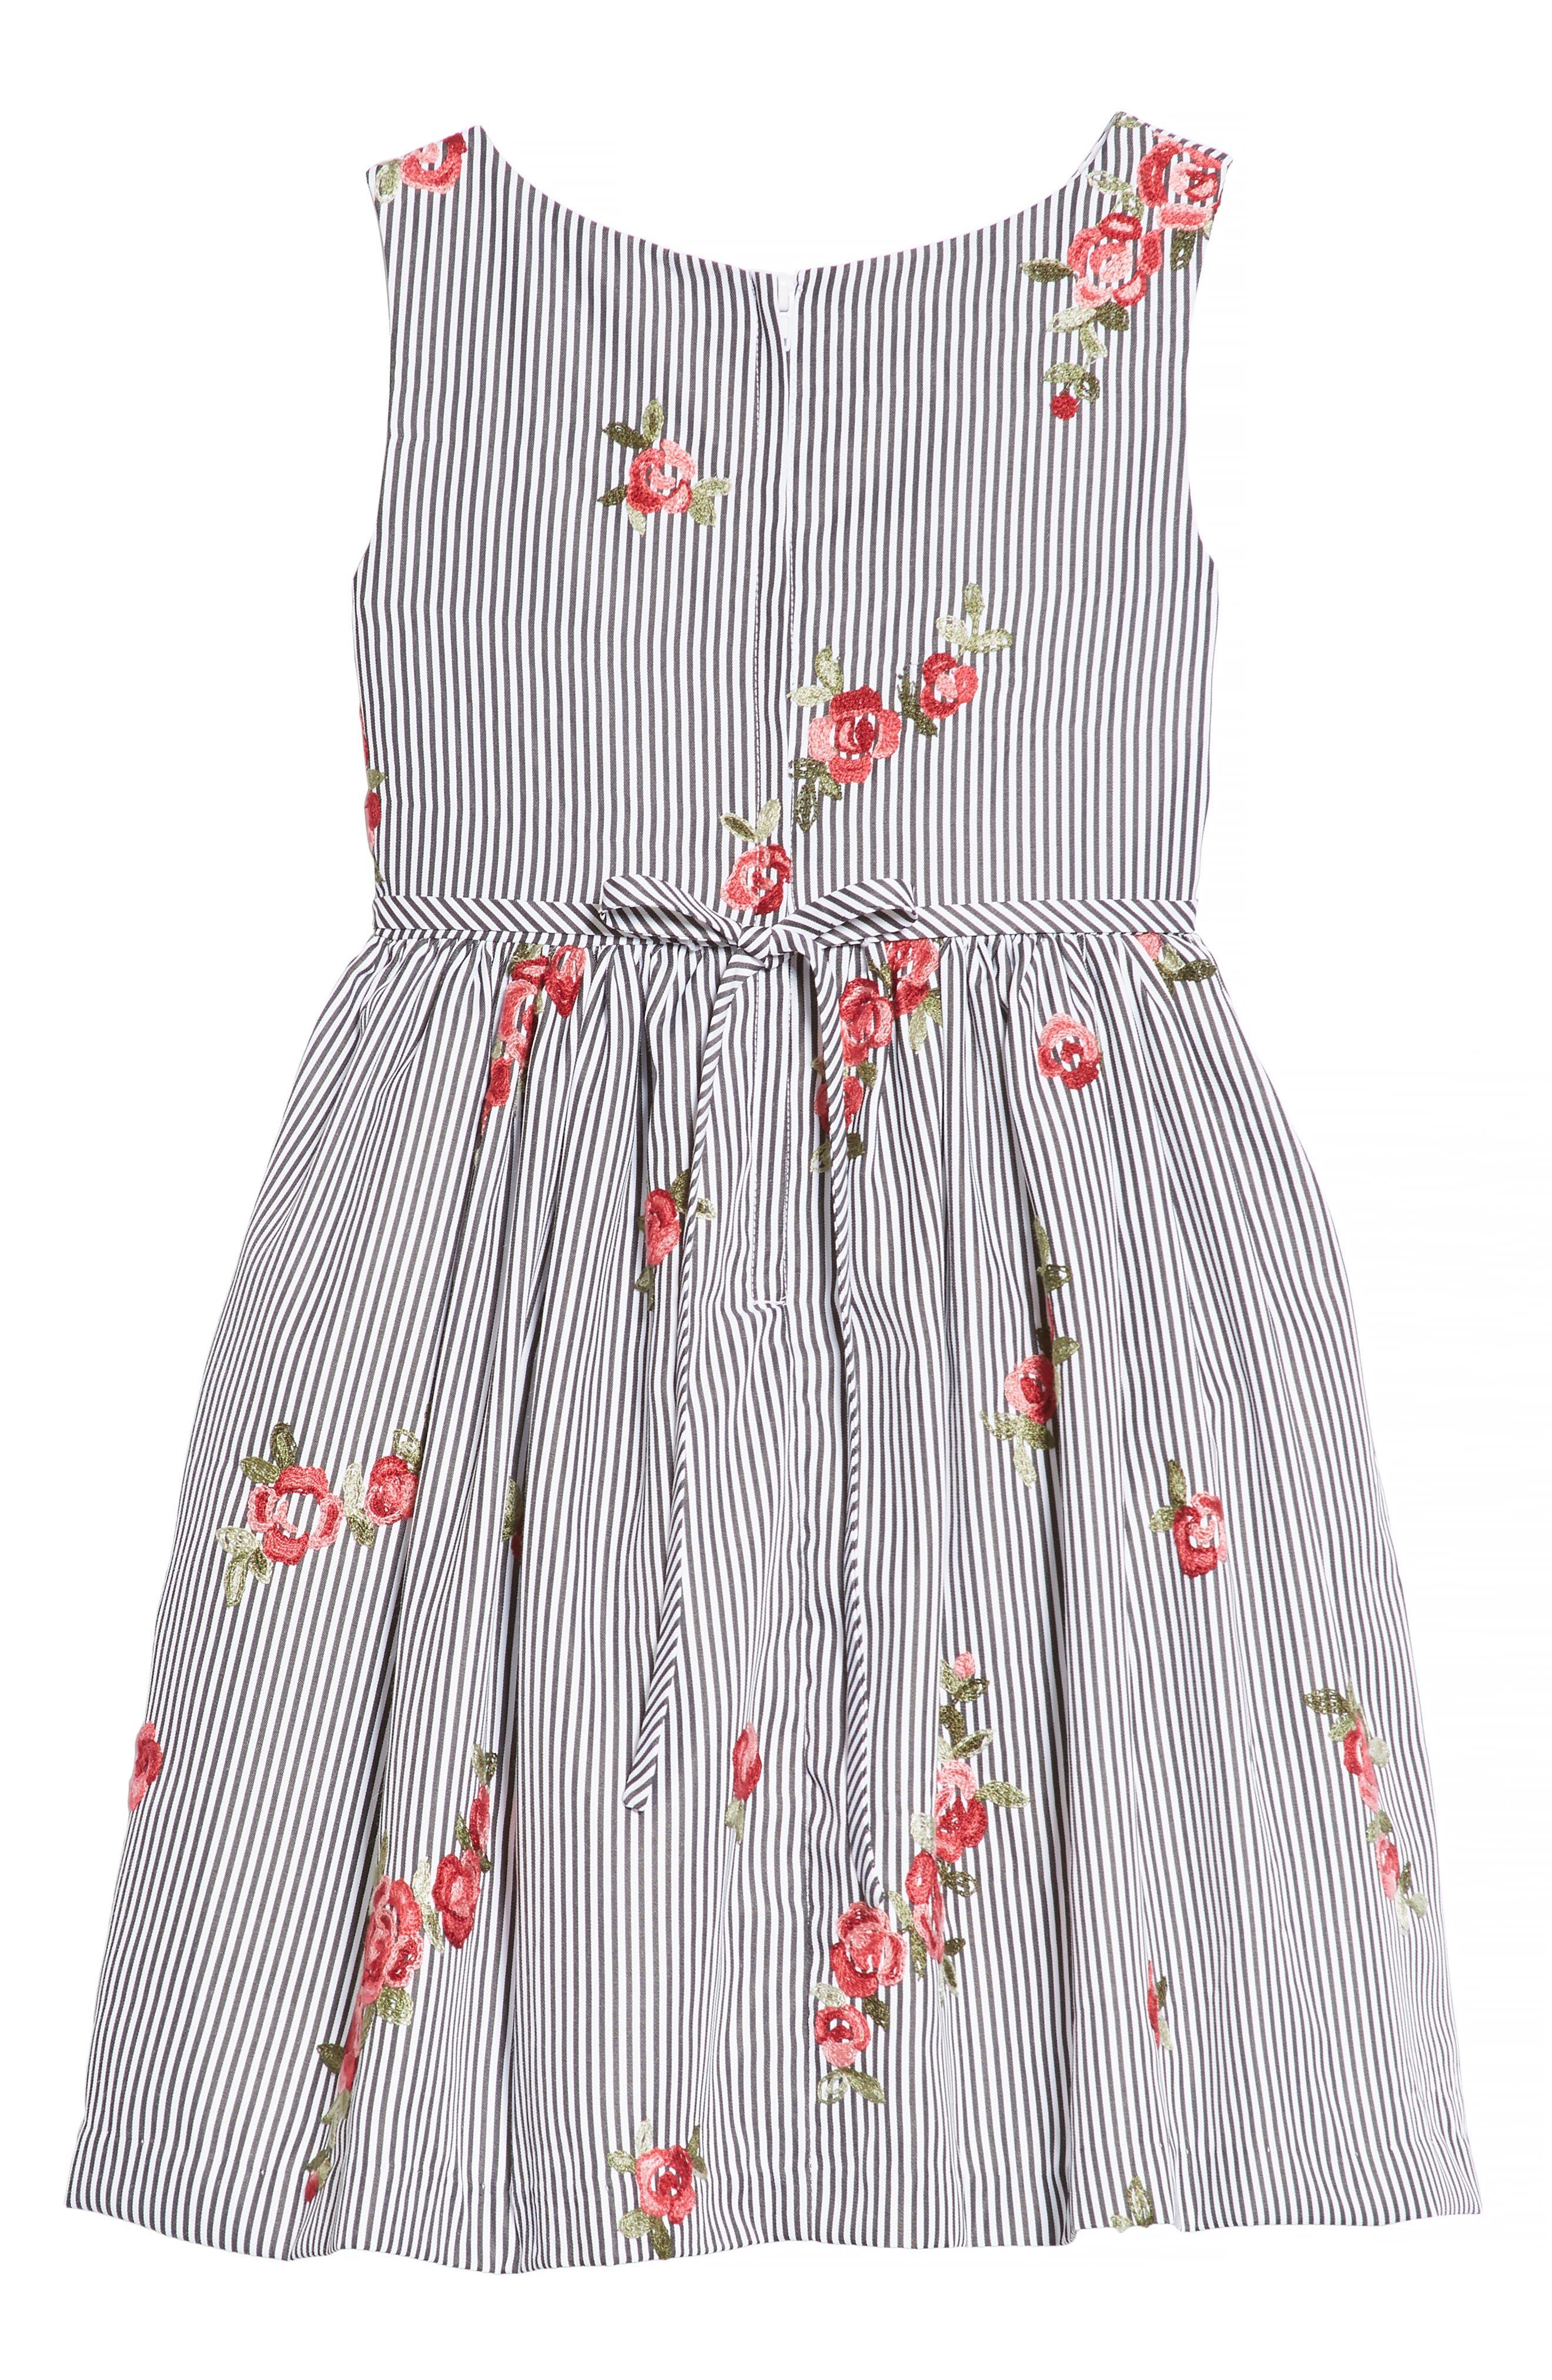 Embroidered Stripe Dress,                             Alternate thumbnail 2, color,                             101